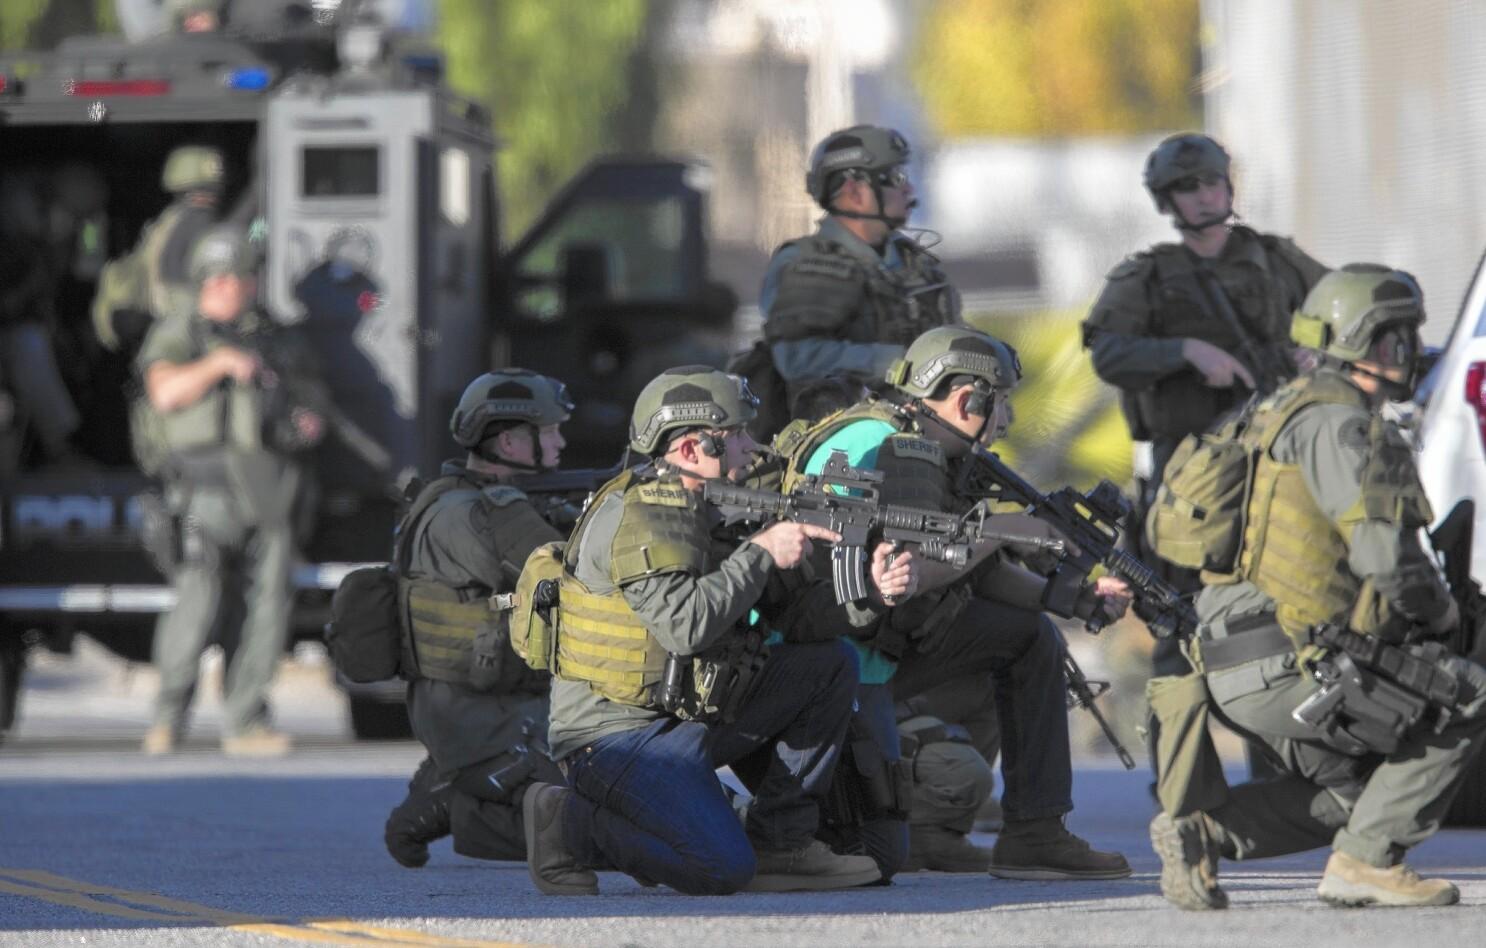 All hell broke loose' as police chased the San Bernardino